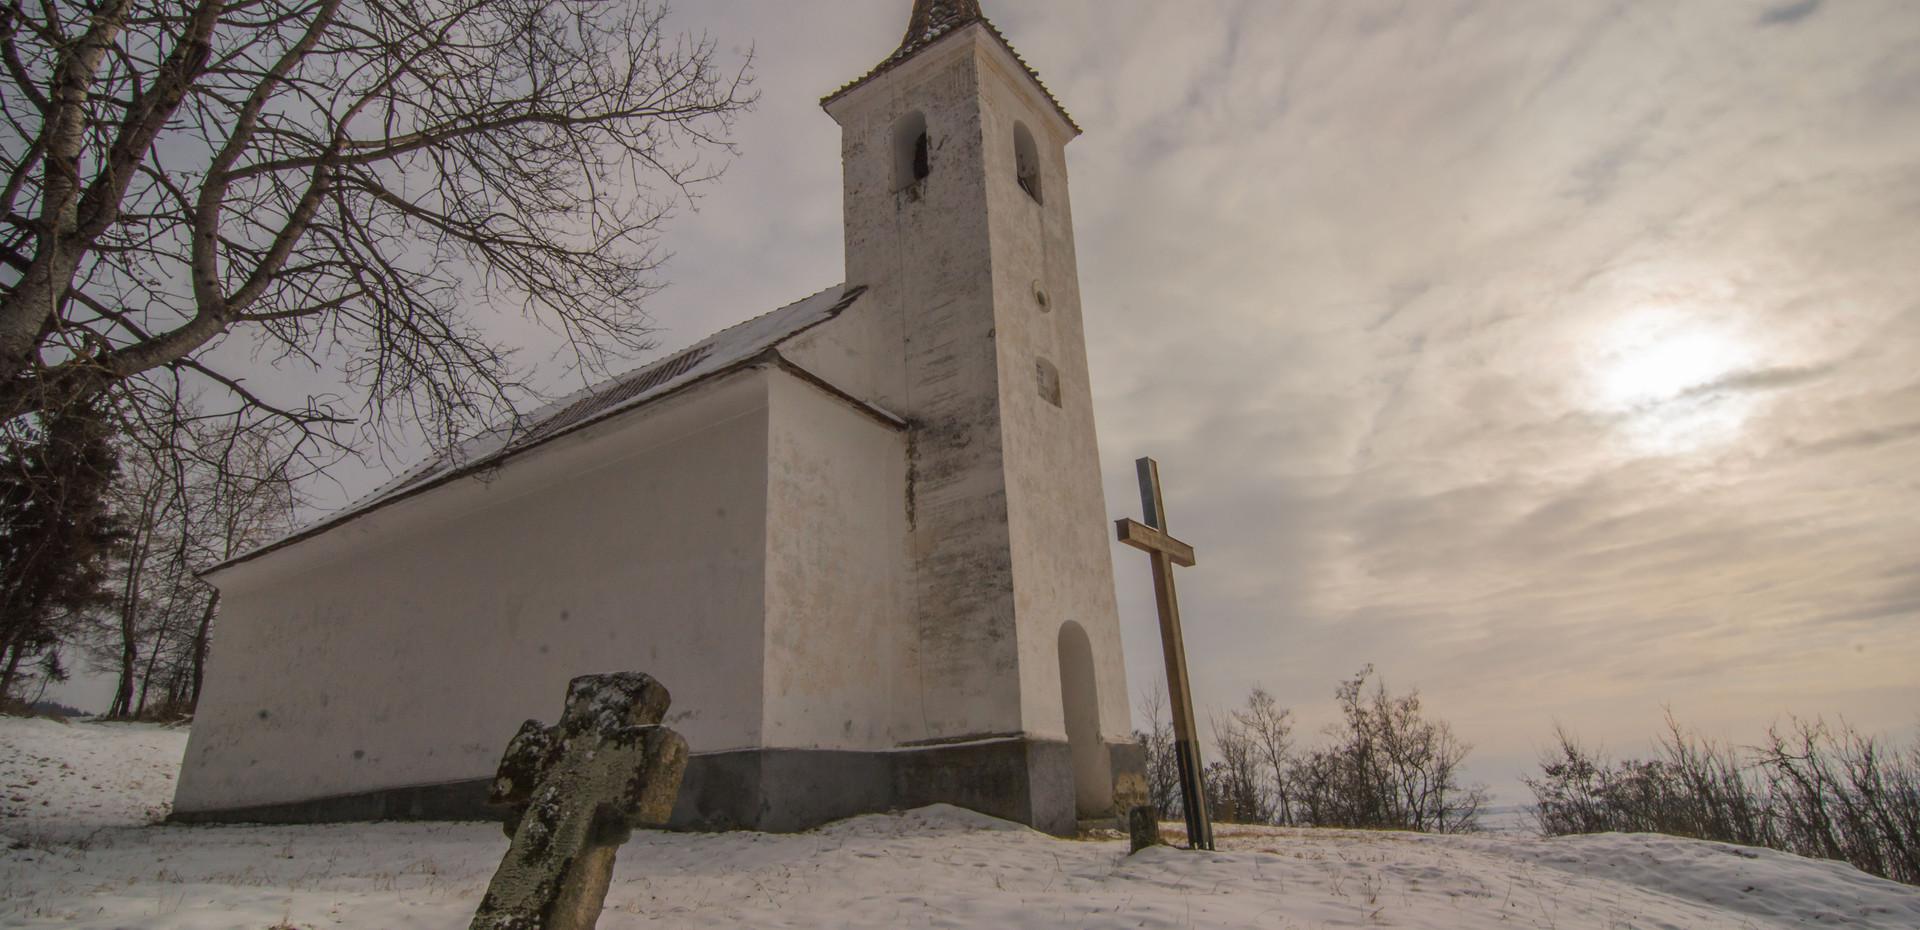 Csíkbánkfalva / Bancu Harghita county / Hargita megye / Județul Harghita Romania / Románia / România / 2017